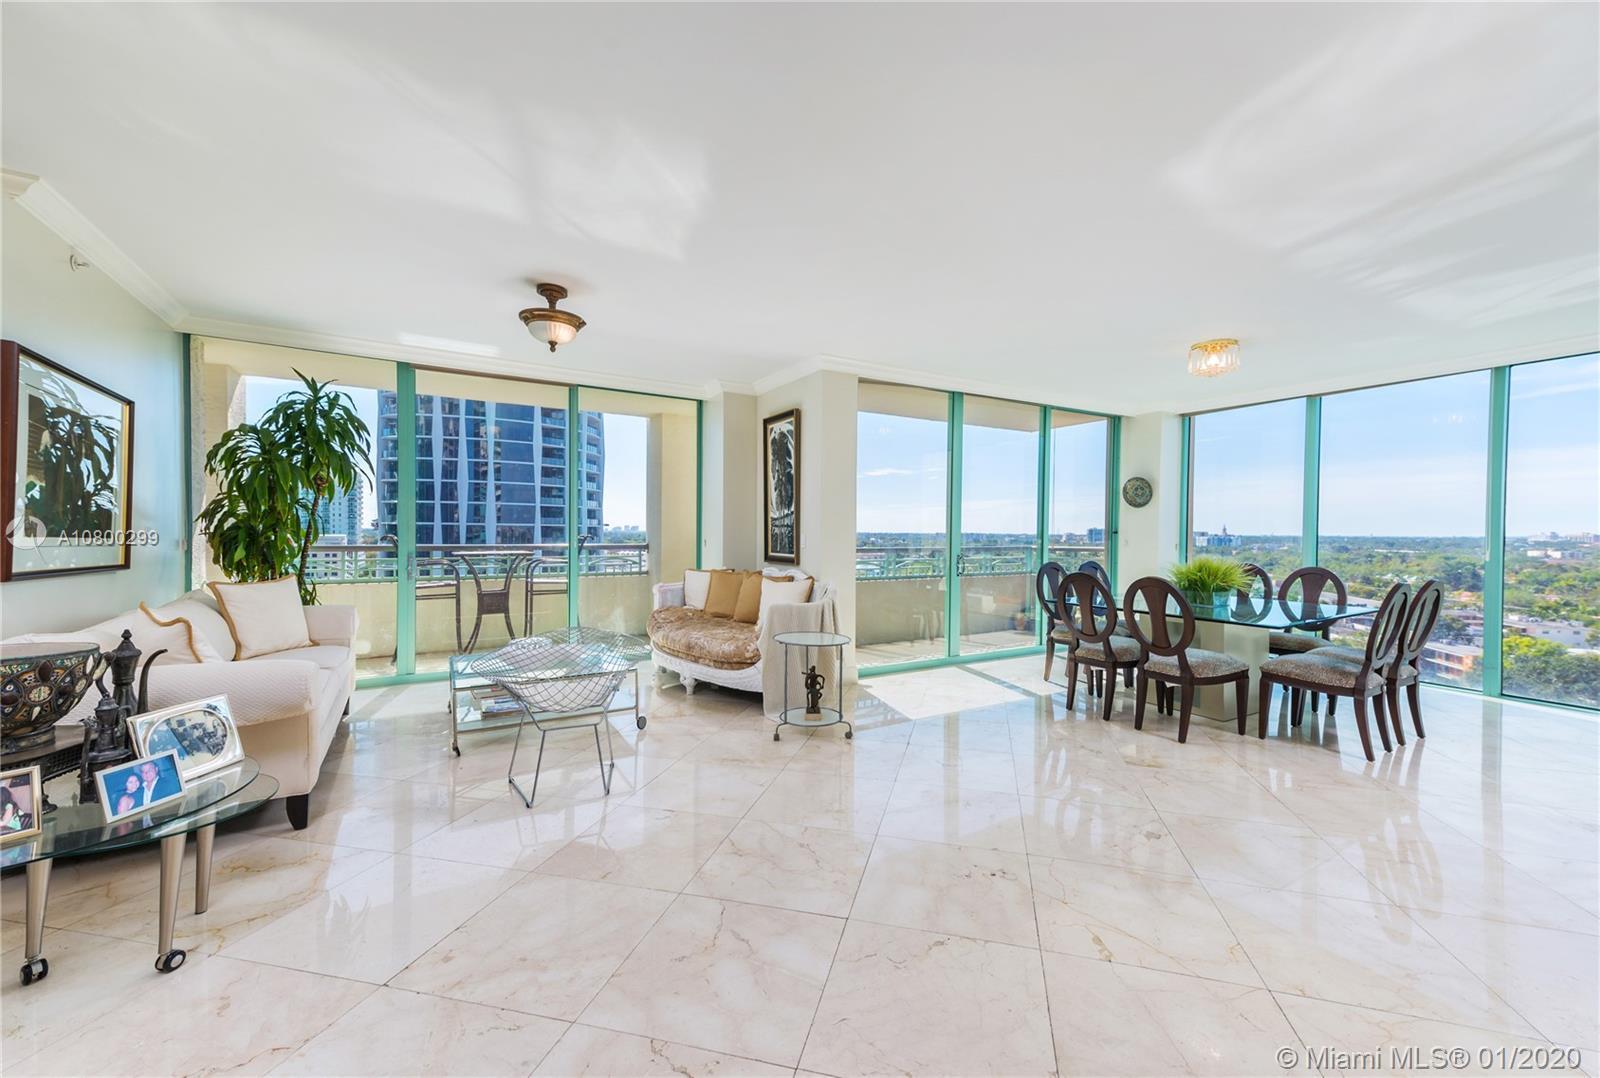 3350 SW 27 Av, 1104 - Miami, Florida